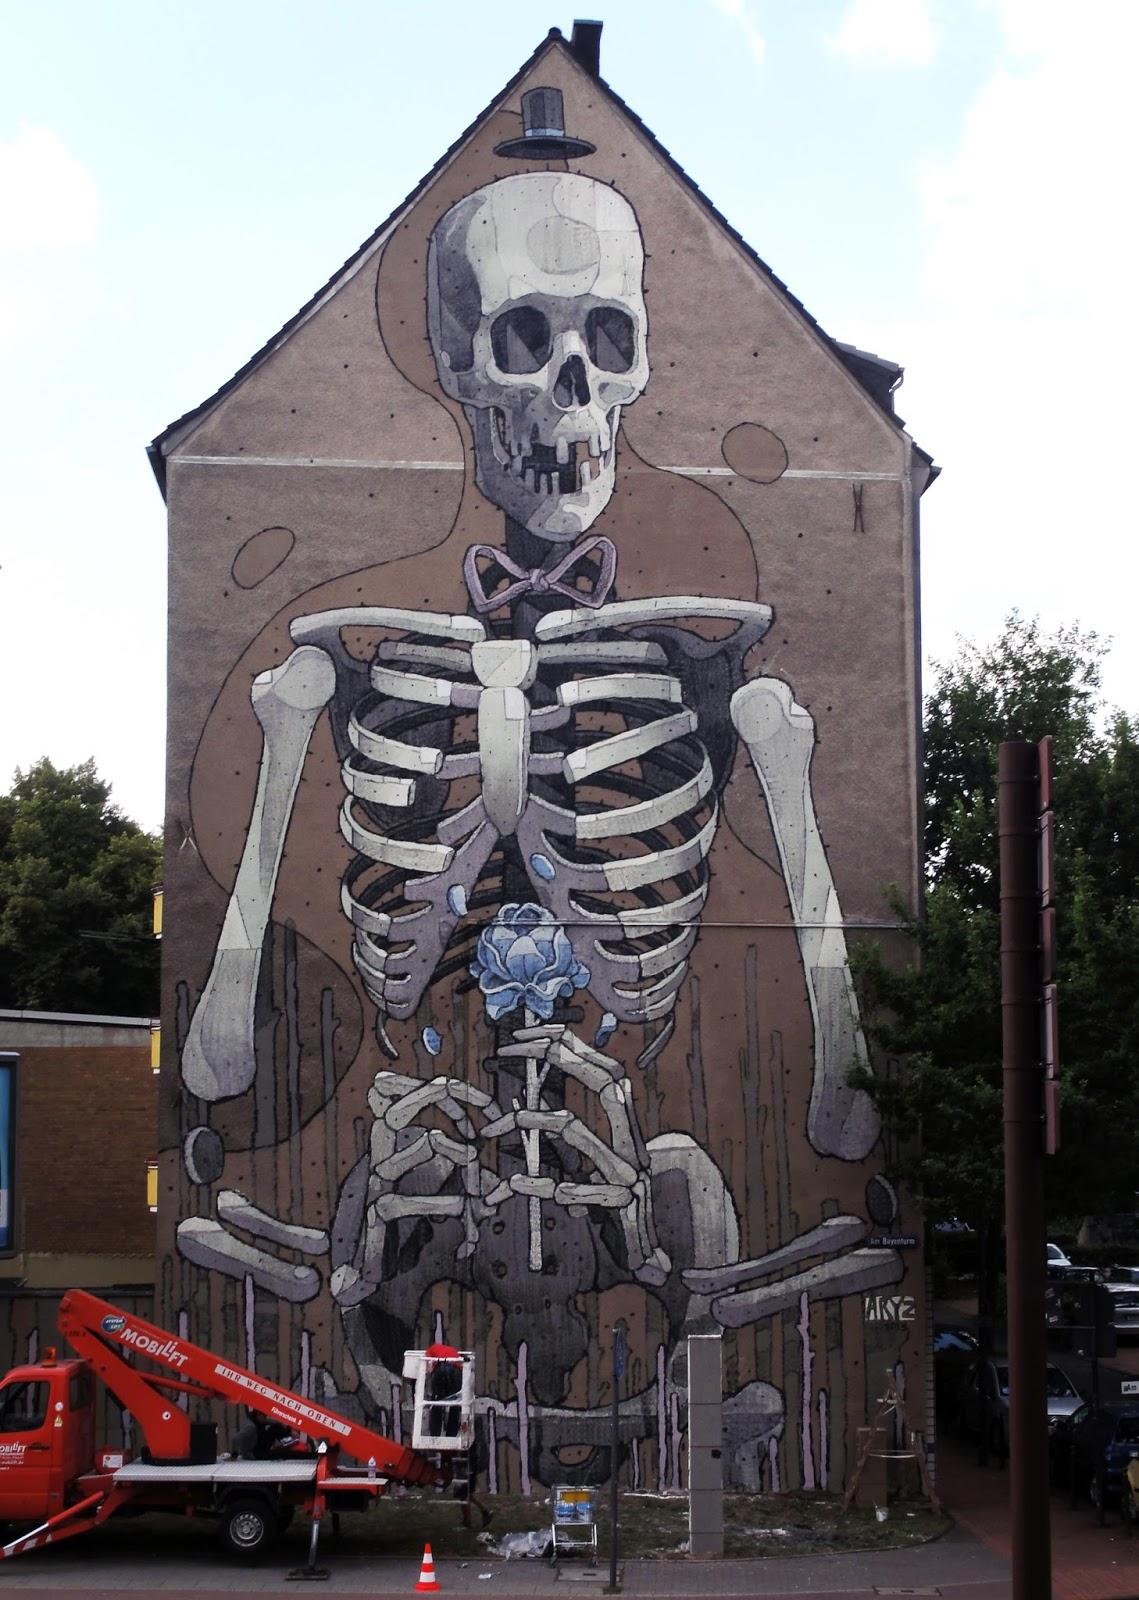 aryz new mural in cologne germany streetartnews streetartnews. Black Bedroom Furniture Sets. Home Design Ideas